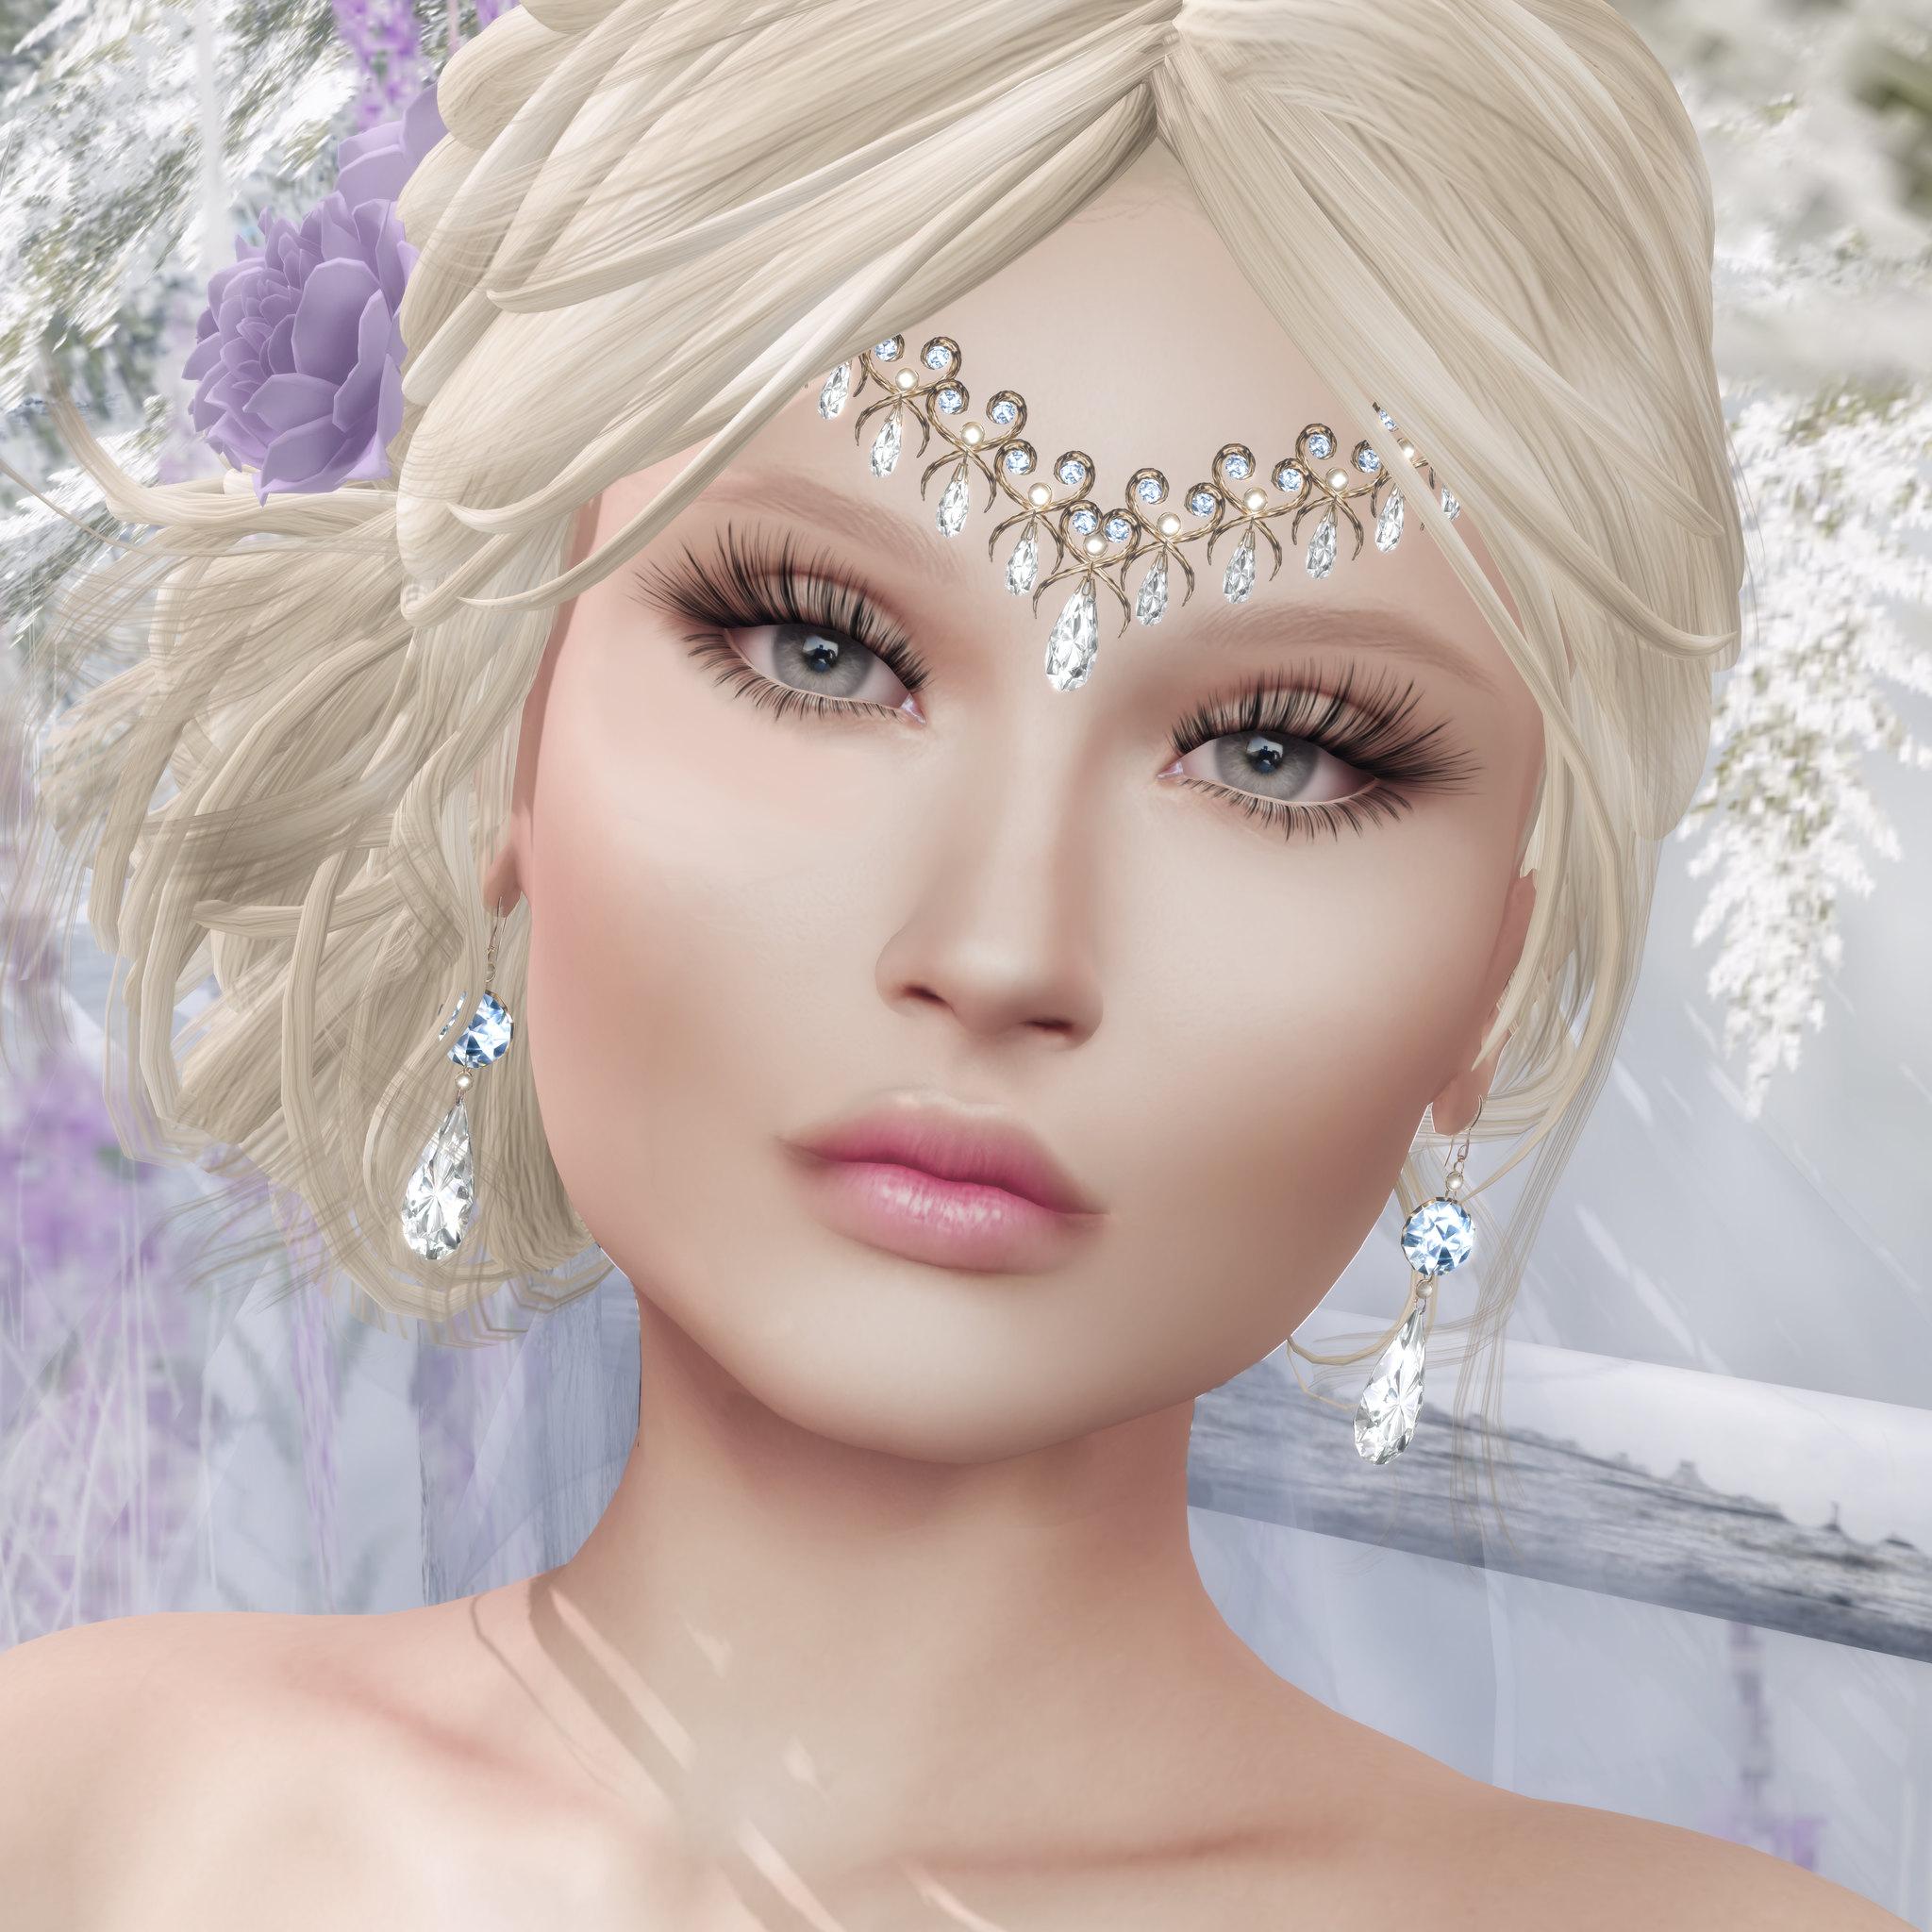 Trunk Show; EMO-tions, Avi Glam = Lia , Catwa appl. @Limit8 ; Zuri Jewelry Group gift